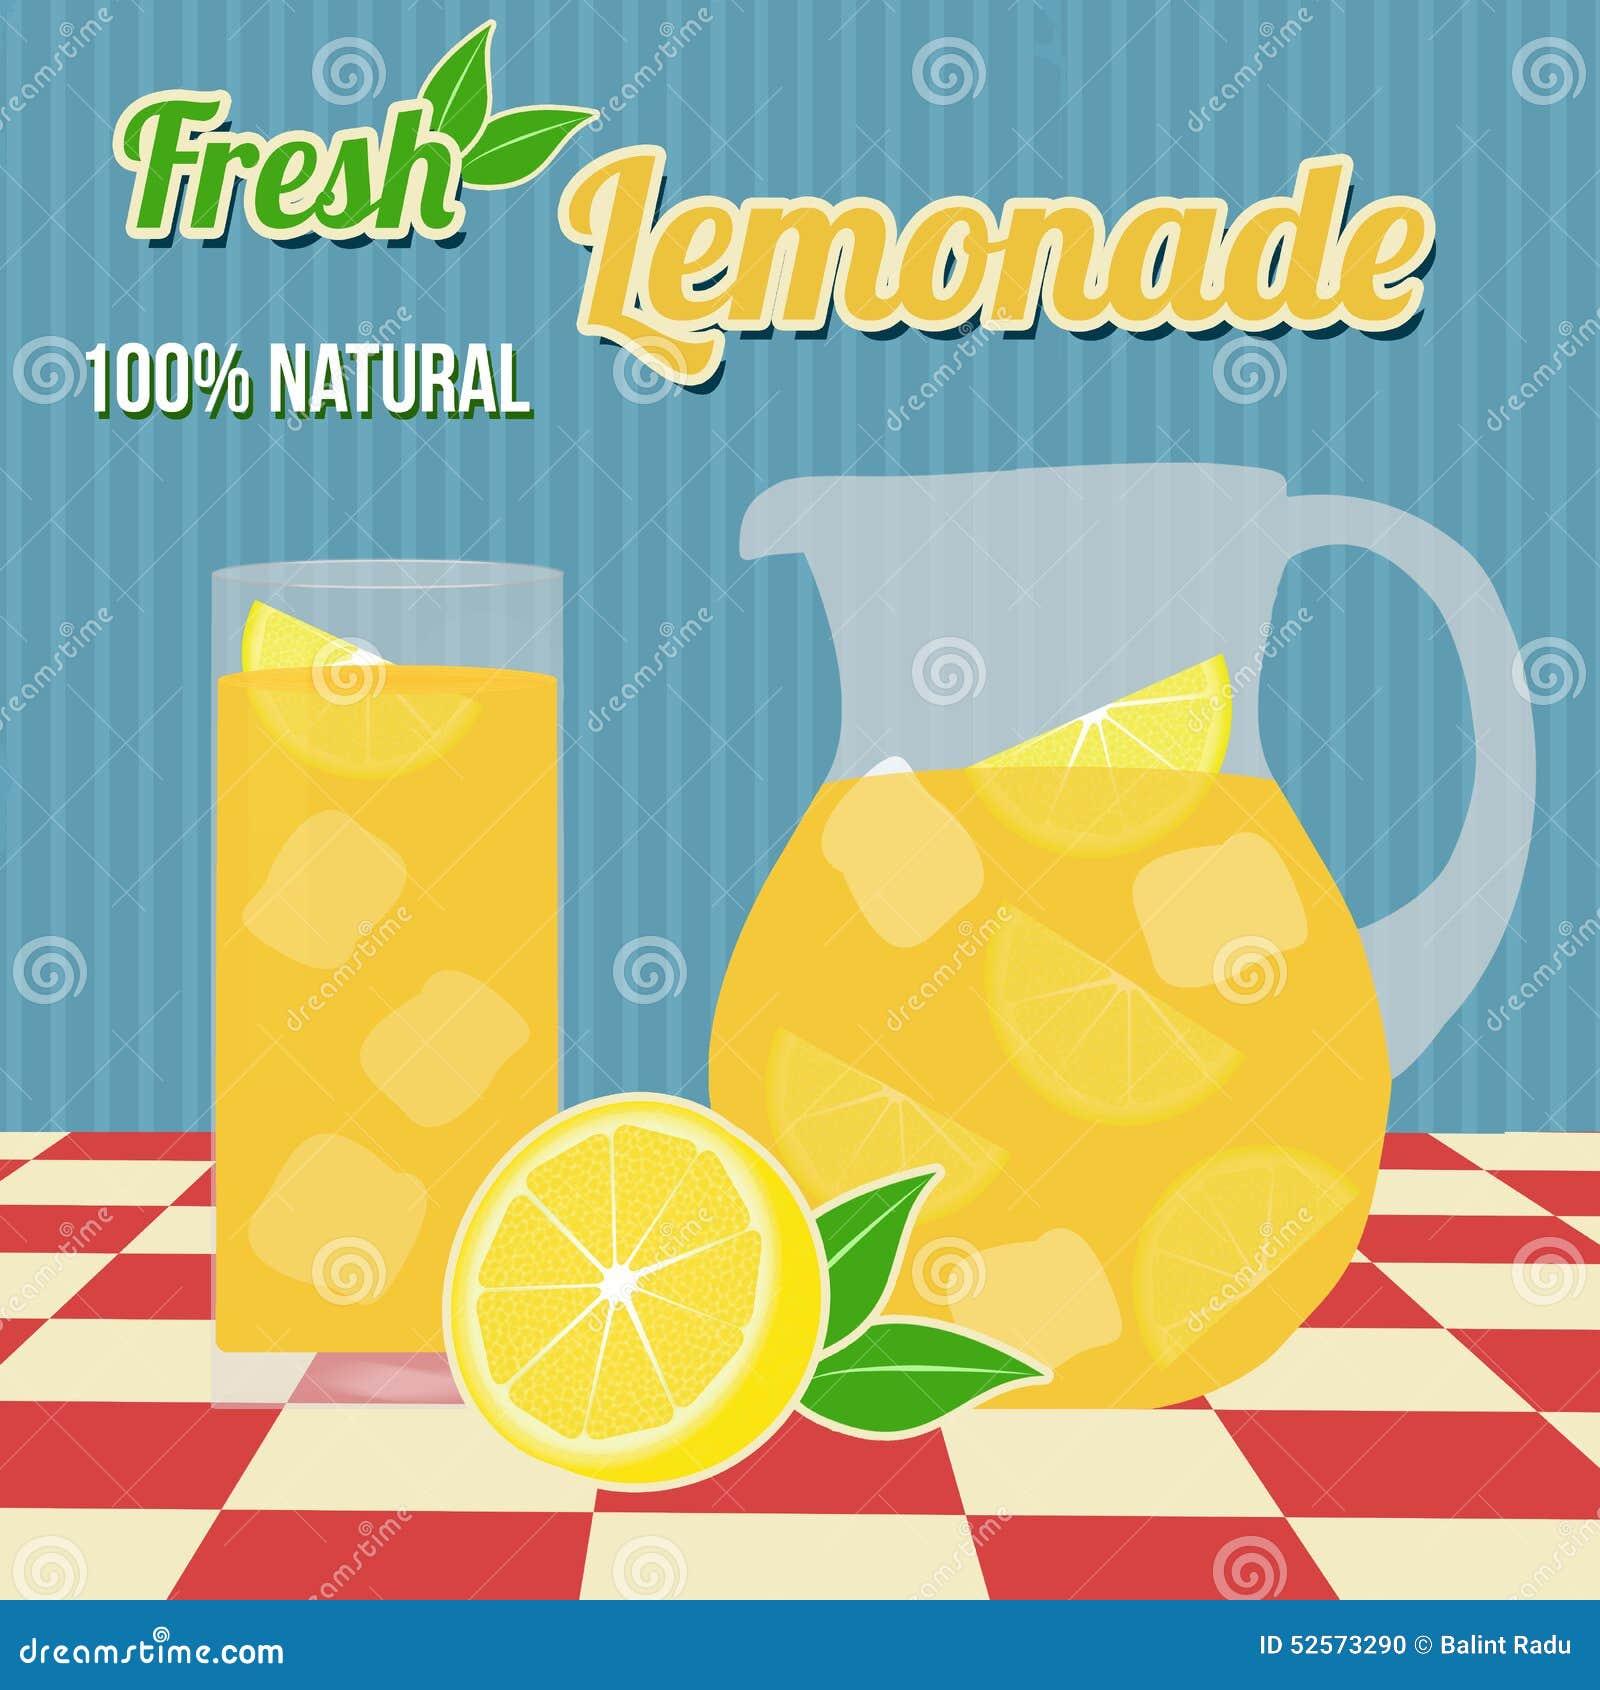 Lemonade Poster Stock Vector - Image: 39386498